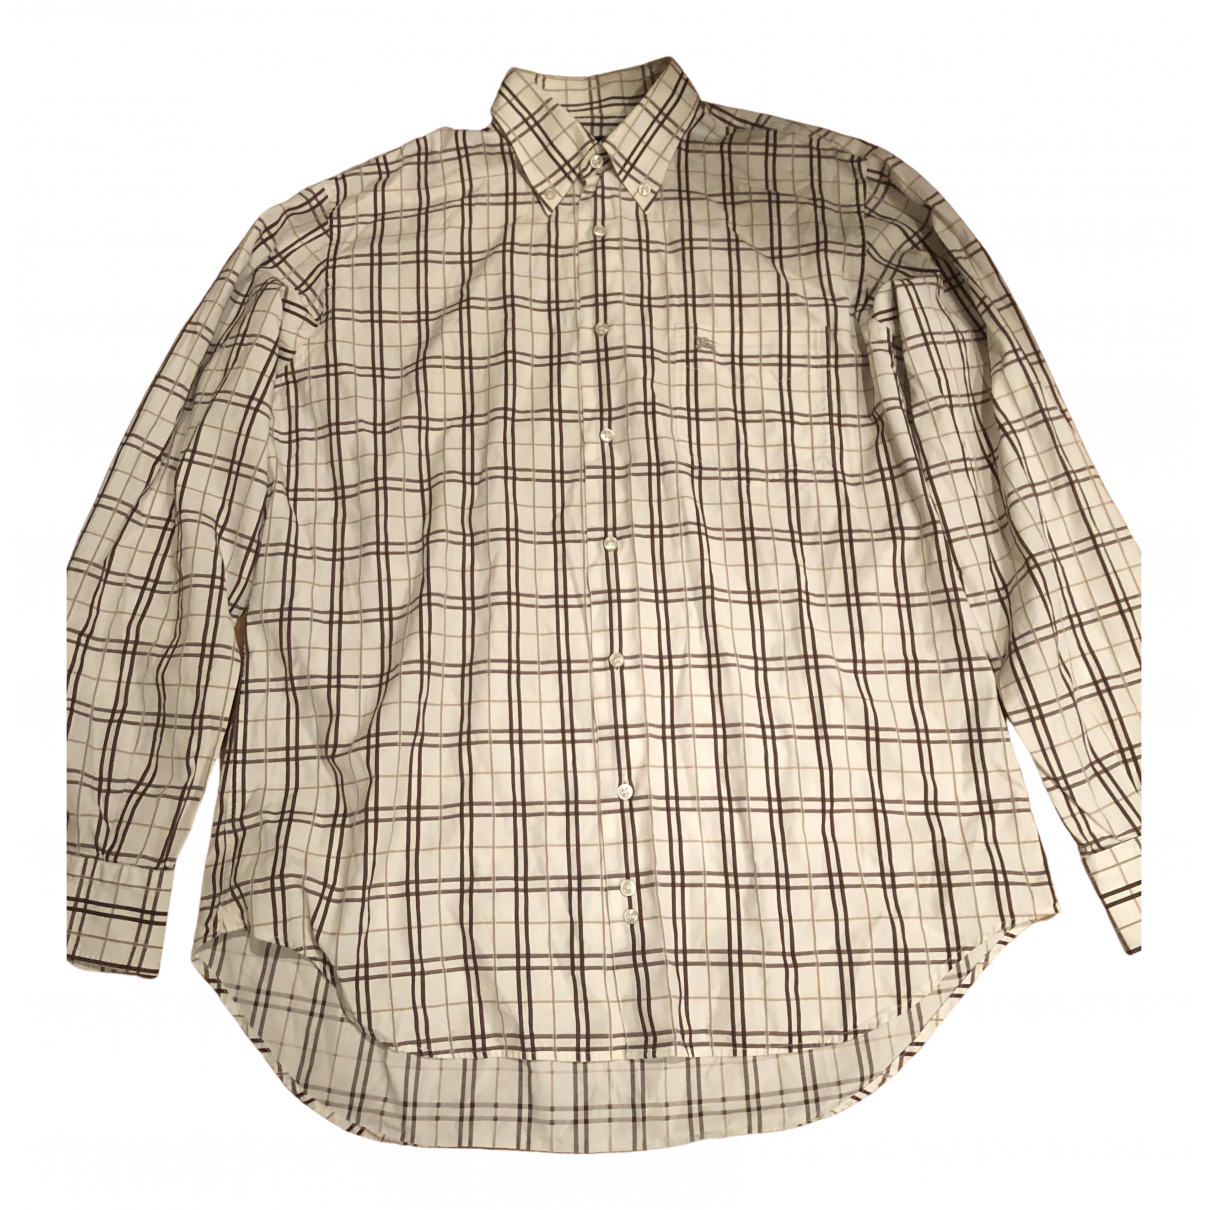 Burberry \N Beige Cotton Shirts for Men L International